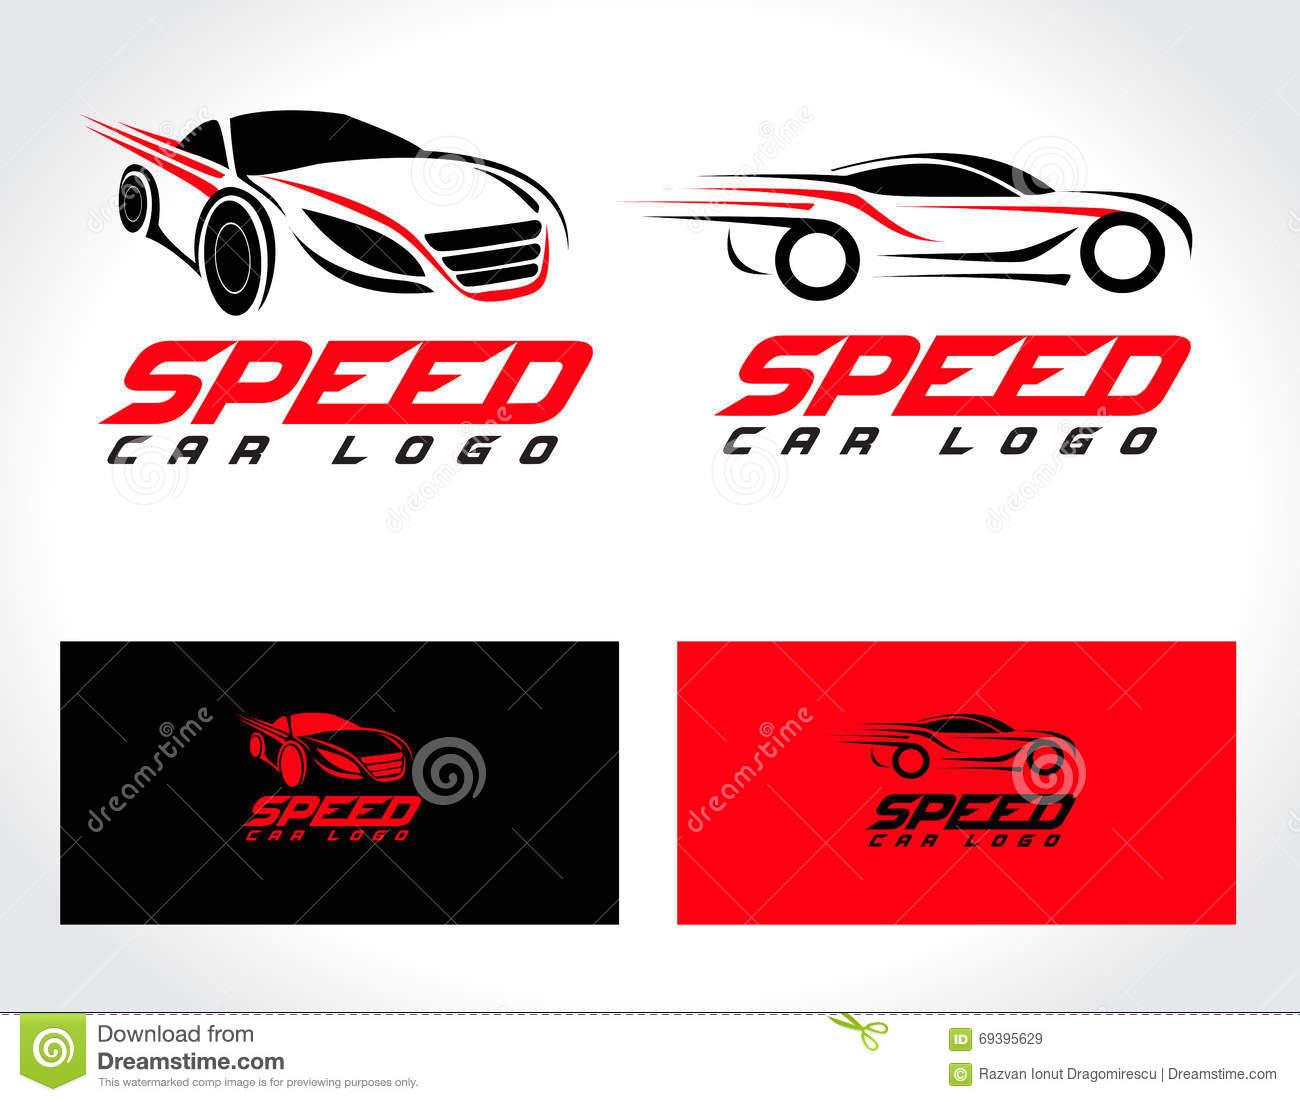 Speed logo clipart jpg Car Logo Design Stock Vector - Image: 69395629 jpg